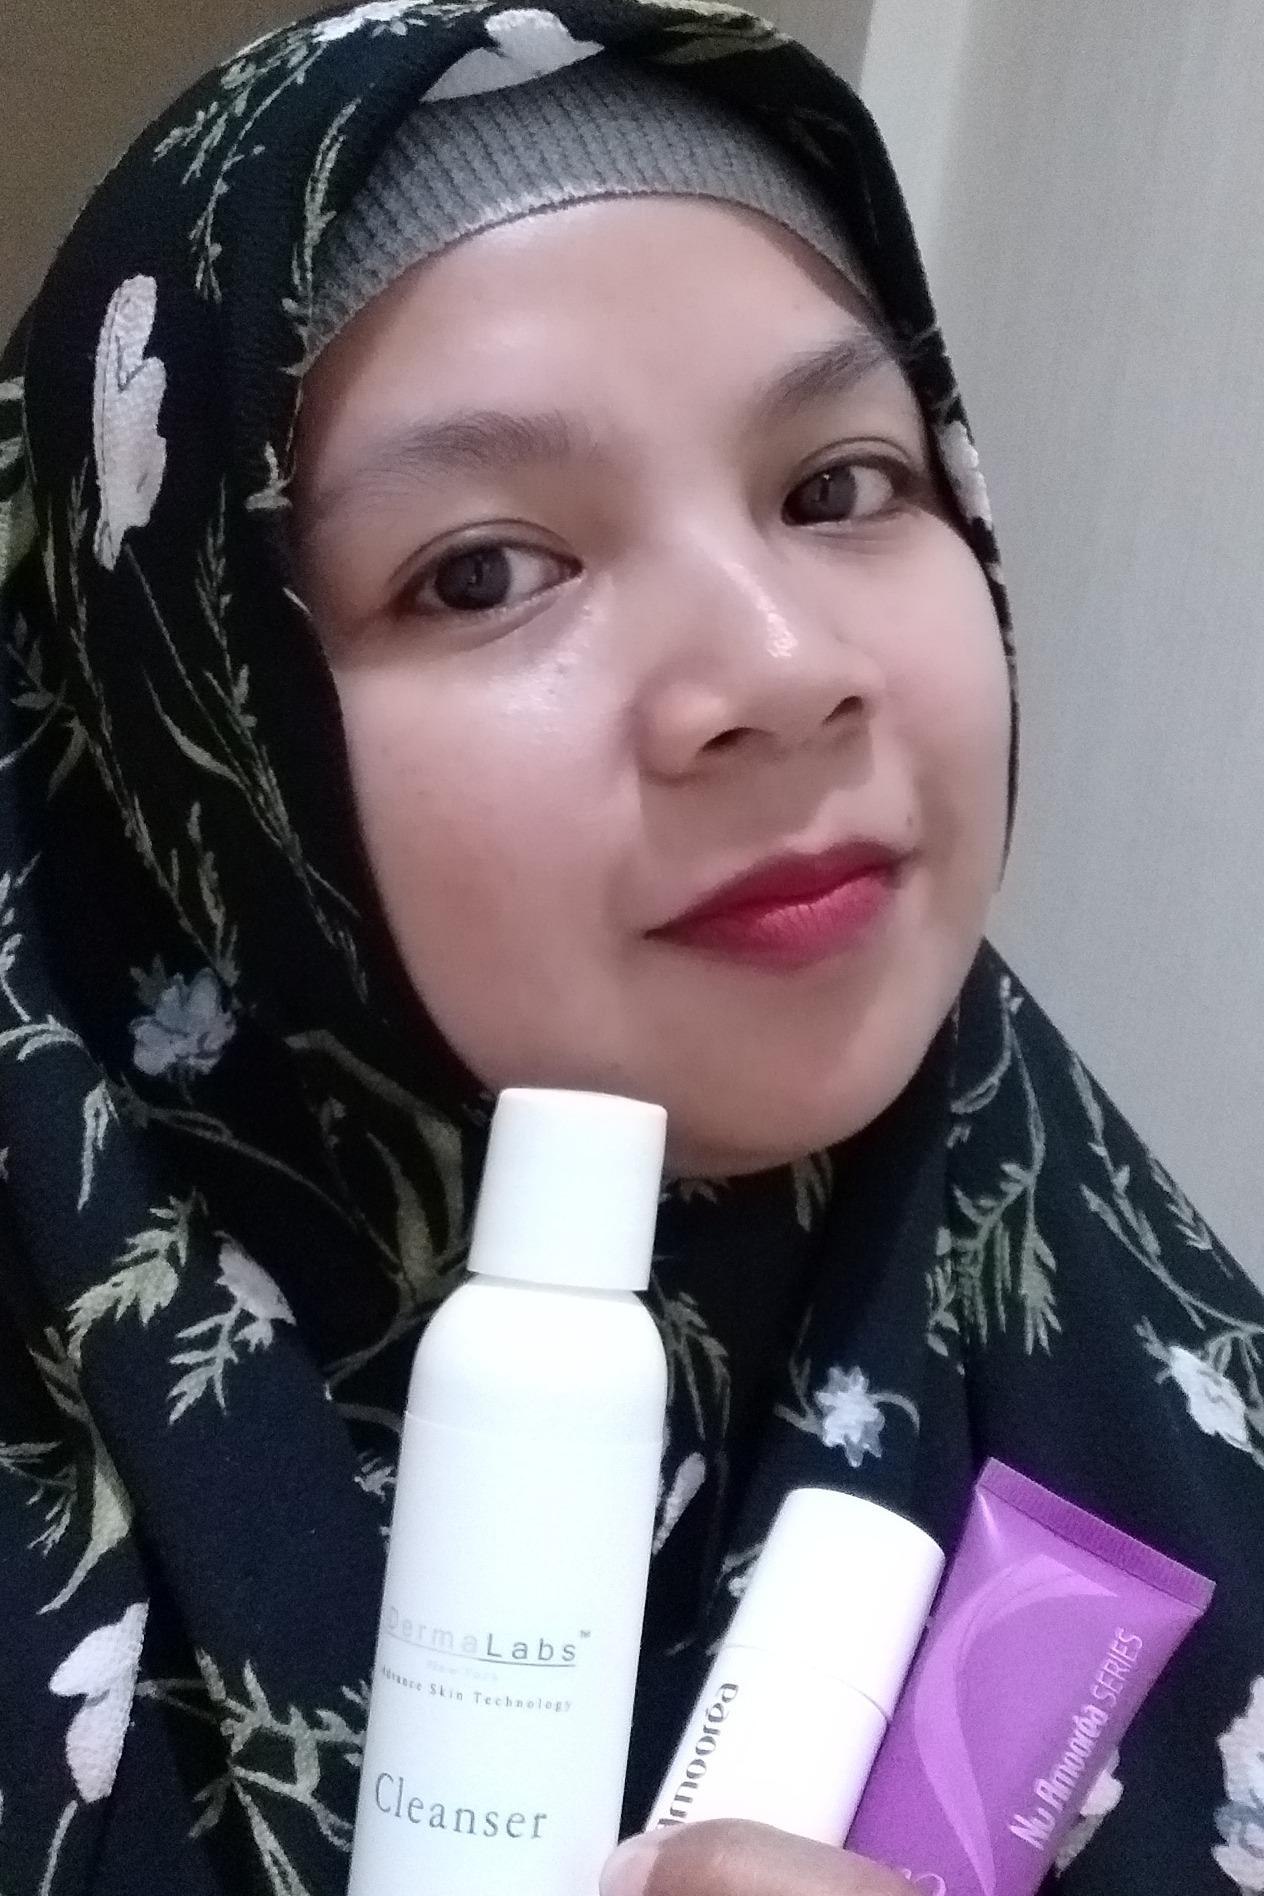 https://nuamooreabeauty.com/cdn/images/member/member-nu-amoorea-180-20191024124041.jpeg